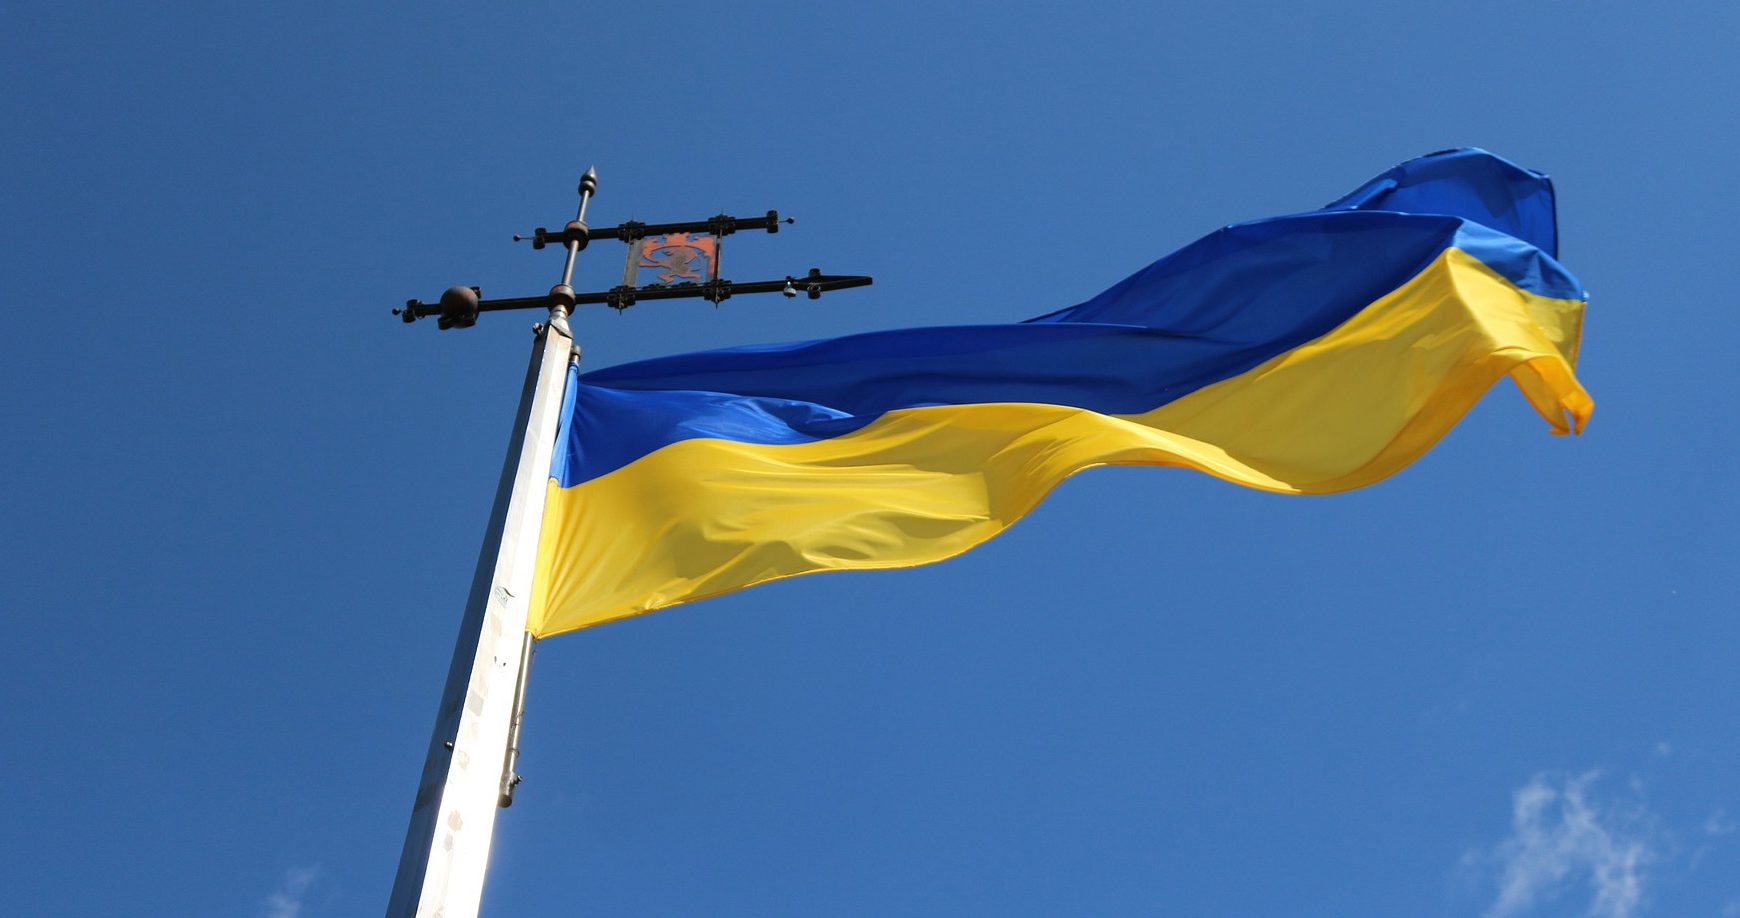 Konflikt na Donbase pokračuje, ruskí hekeri útočia na ukrajinské vojsko a obranu